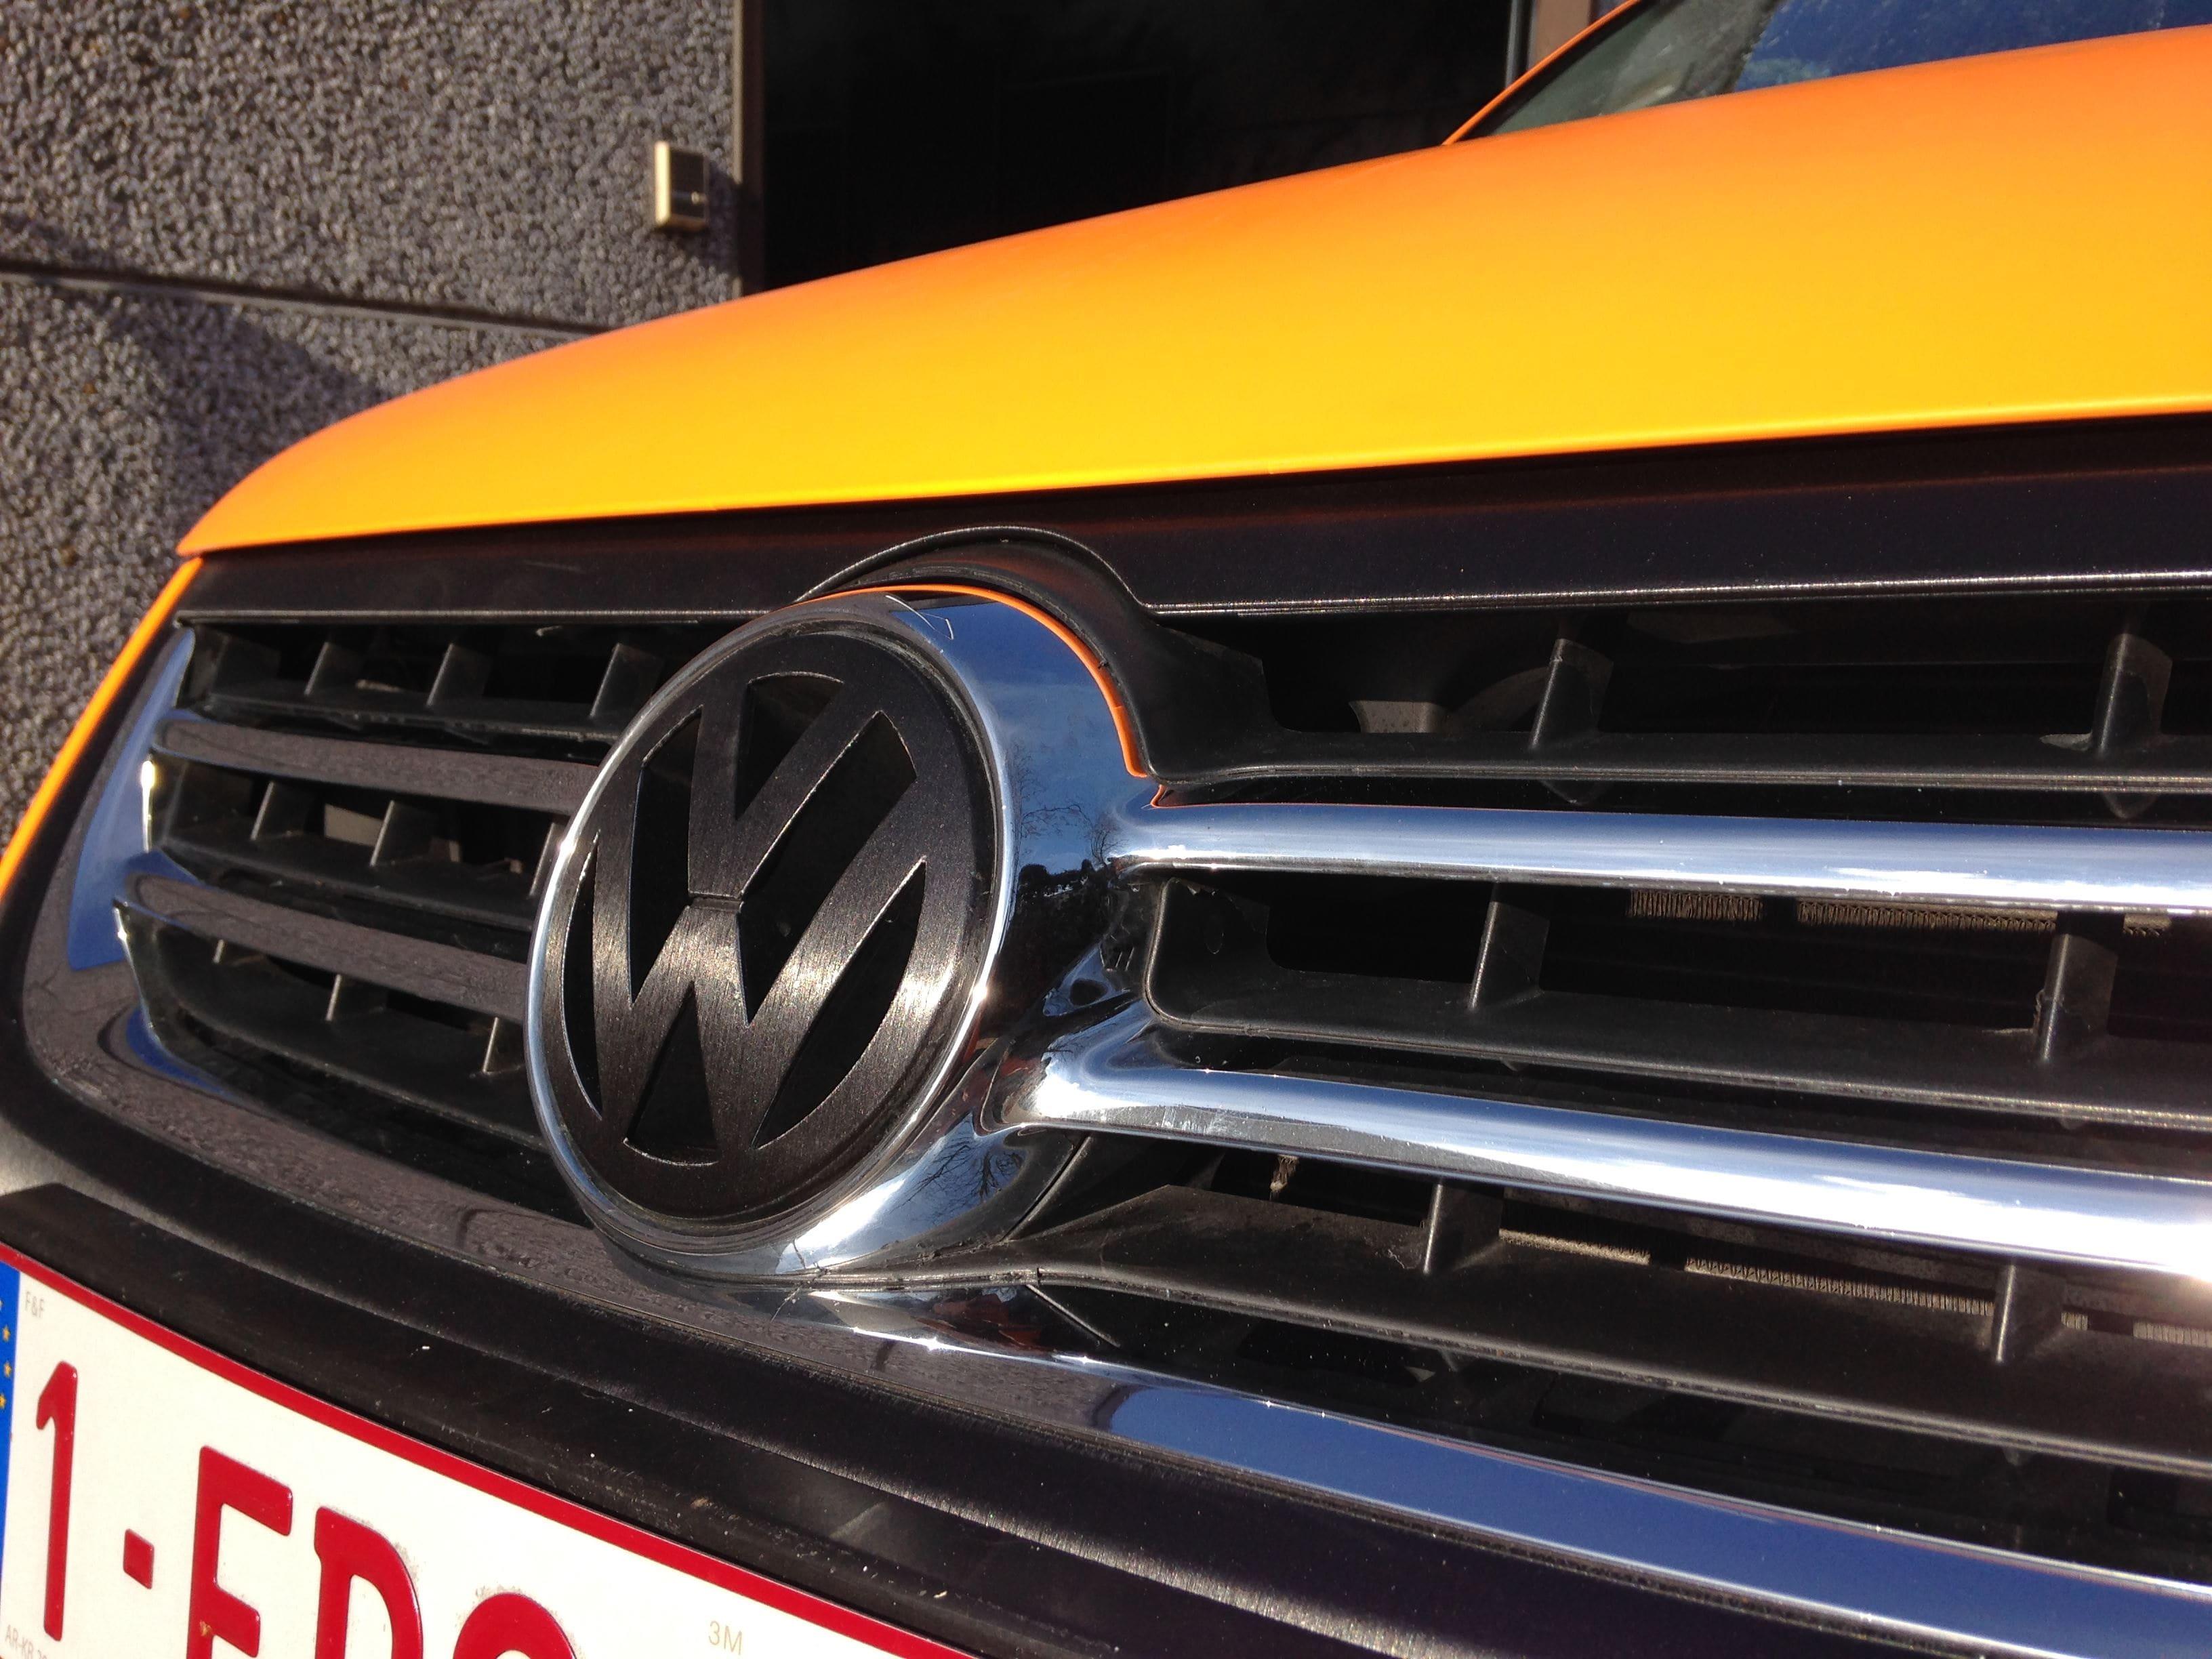 Volkswagen Touareg met Mat Oranje Wrap, Carwrapping door Wrapmyride.nu Foto-nr:7391, ©2021